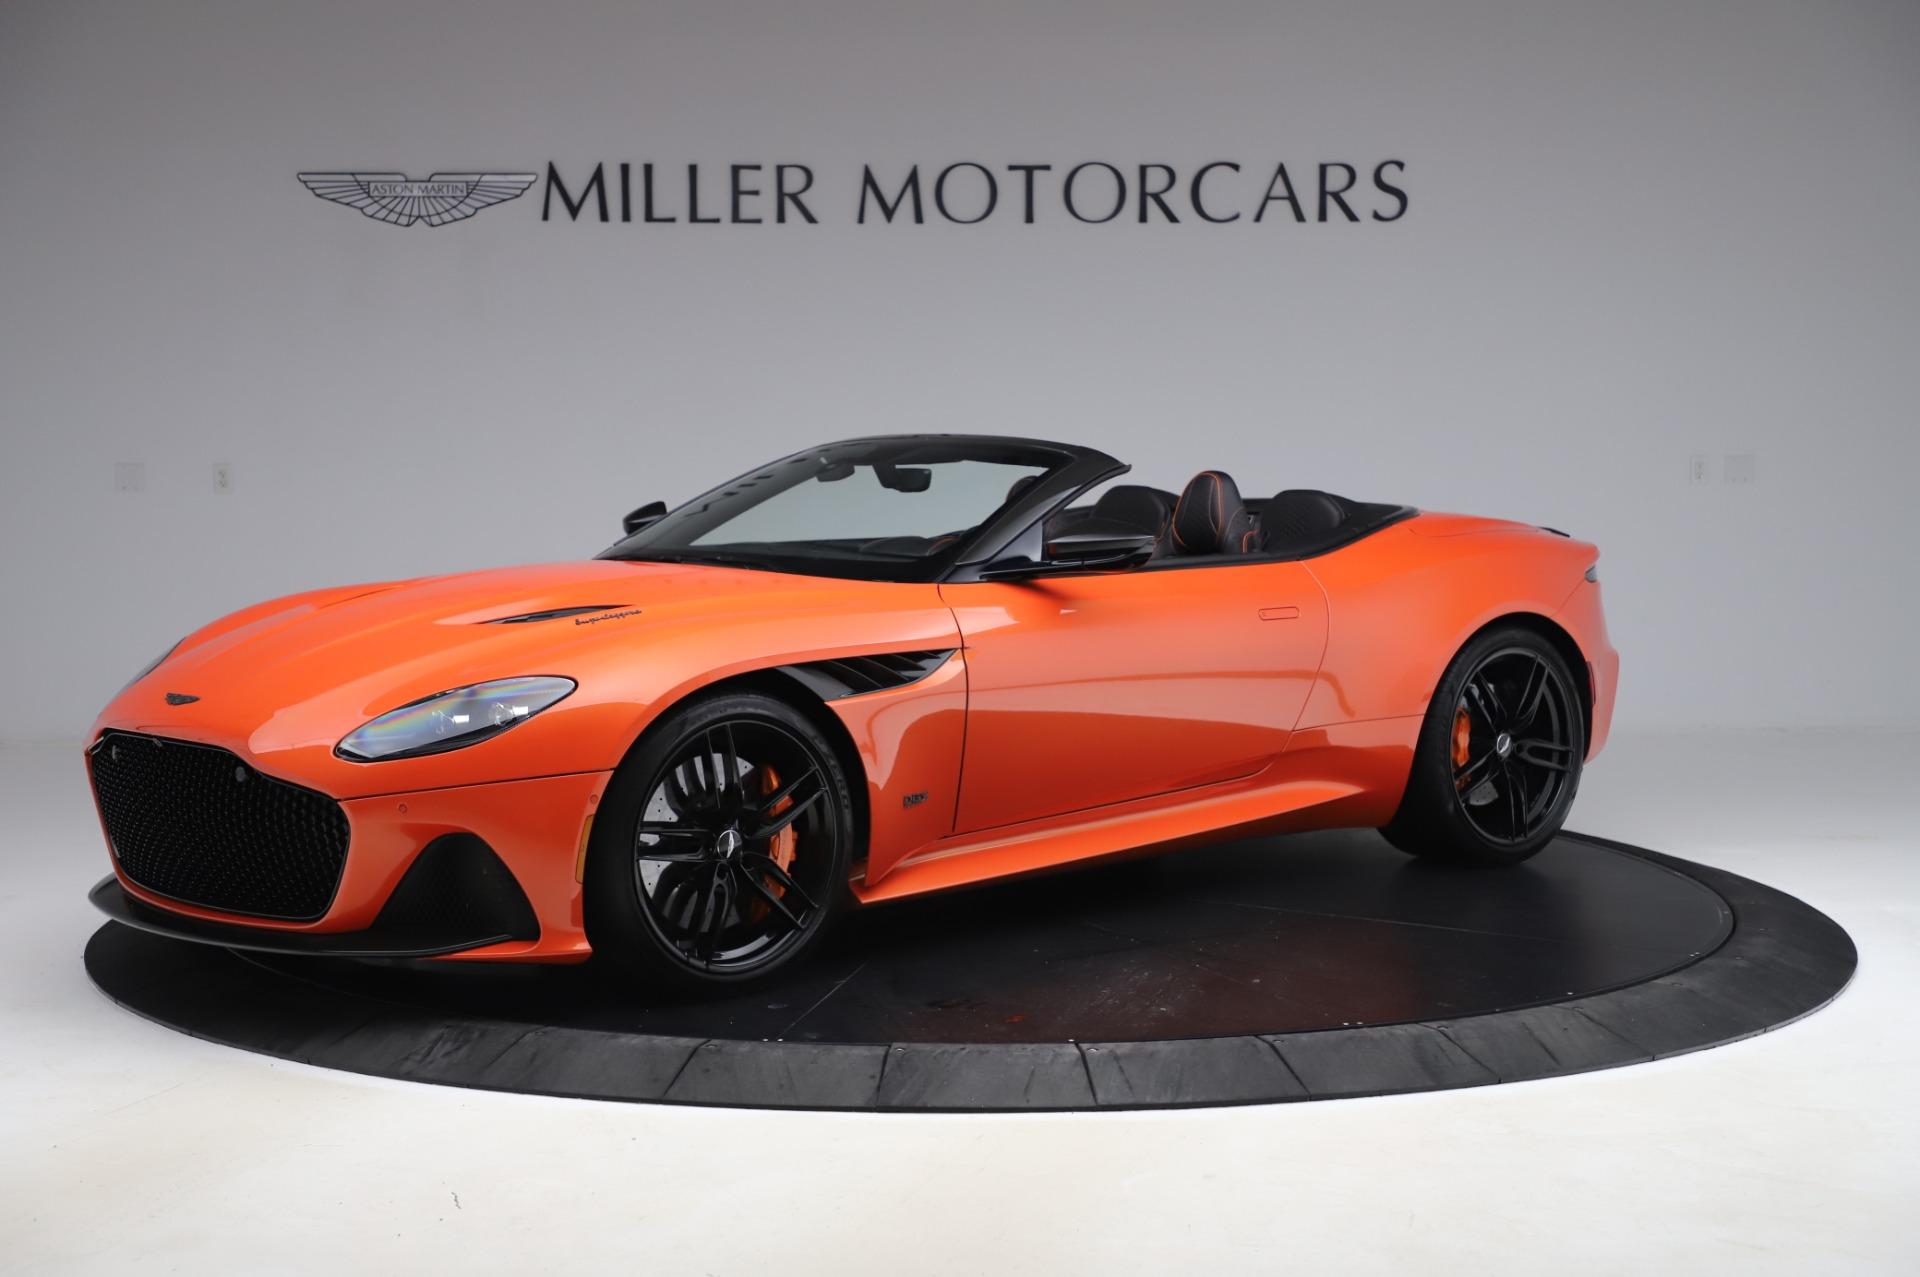 Used 2020 Aston Martin DBS Superleggera for sale $339,900 at McLaren Greenwich in Greenwich CT 06830 1